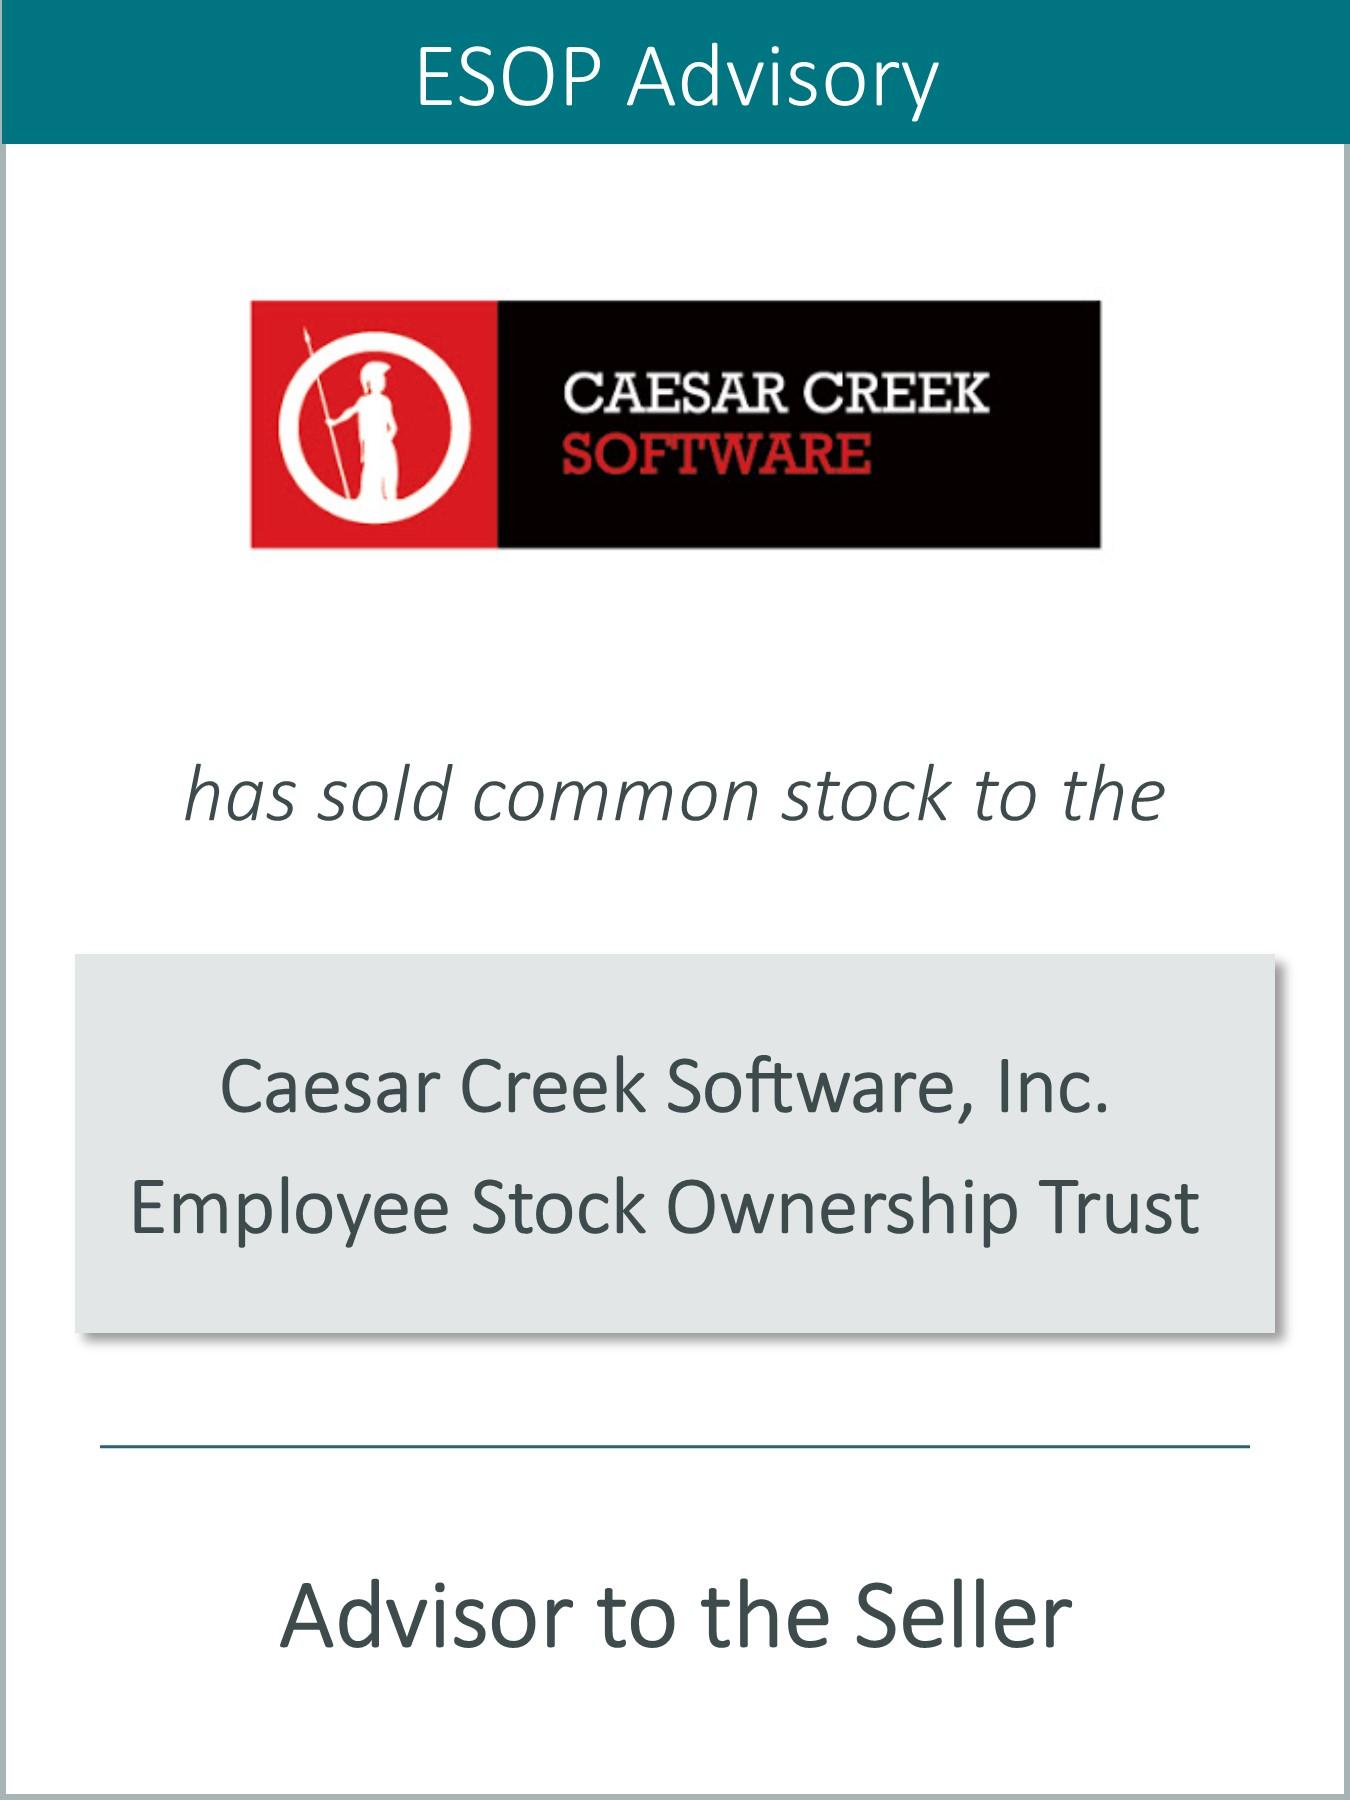 Prairie Announces the Sale of Caesar Creek Software Inc. to an ESOP